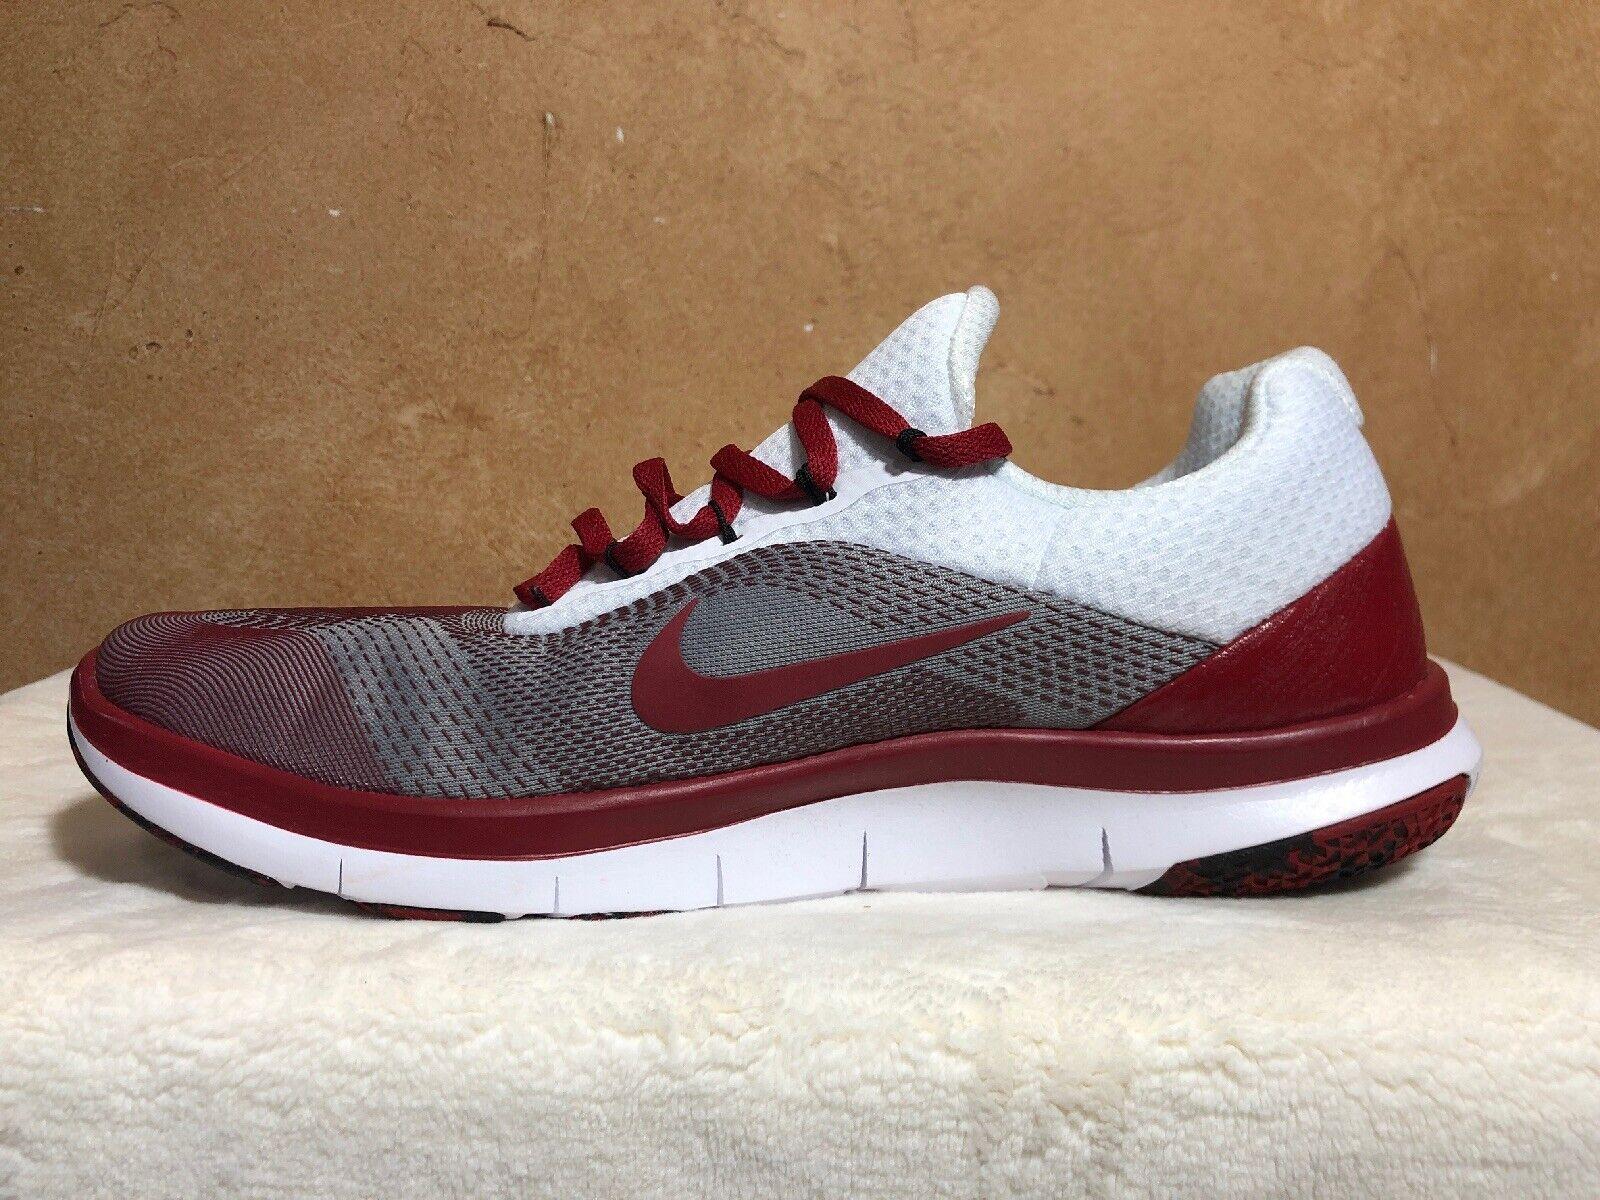 Nike Oklahoma Sooners kostenlos Trainer V7 Vecka noll skor AA0881 -601 Storlek 10 M USA